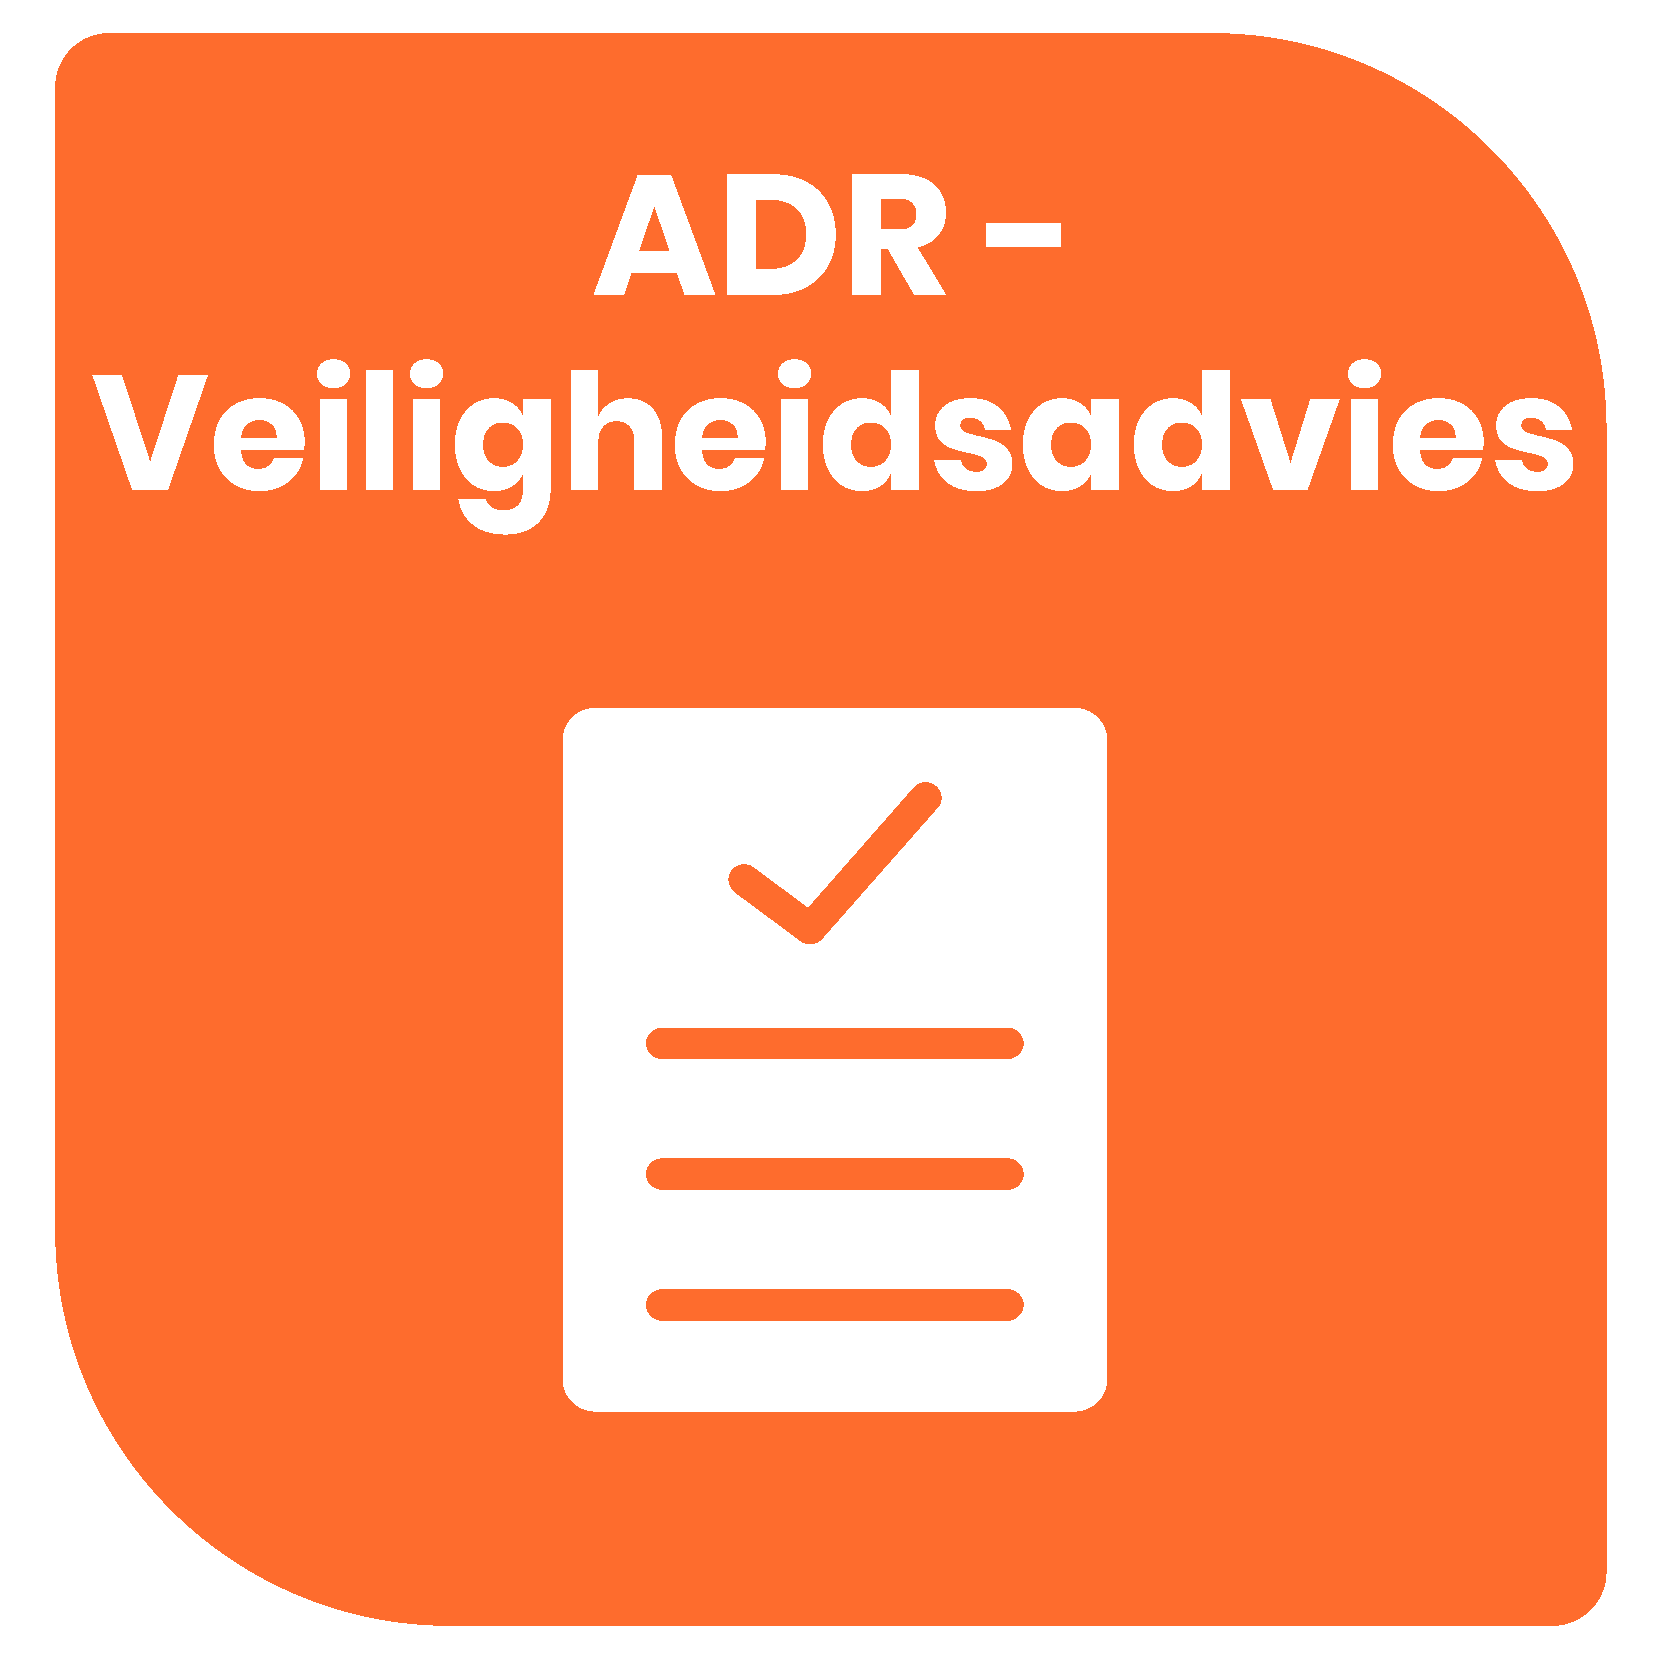 ADR_Veiligheidsadvies